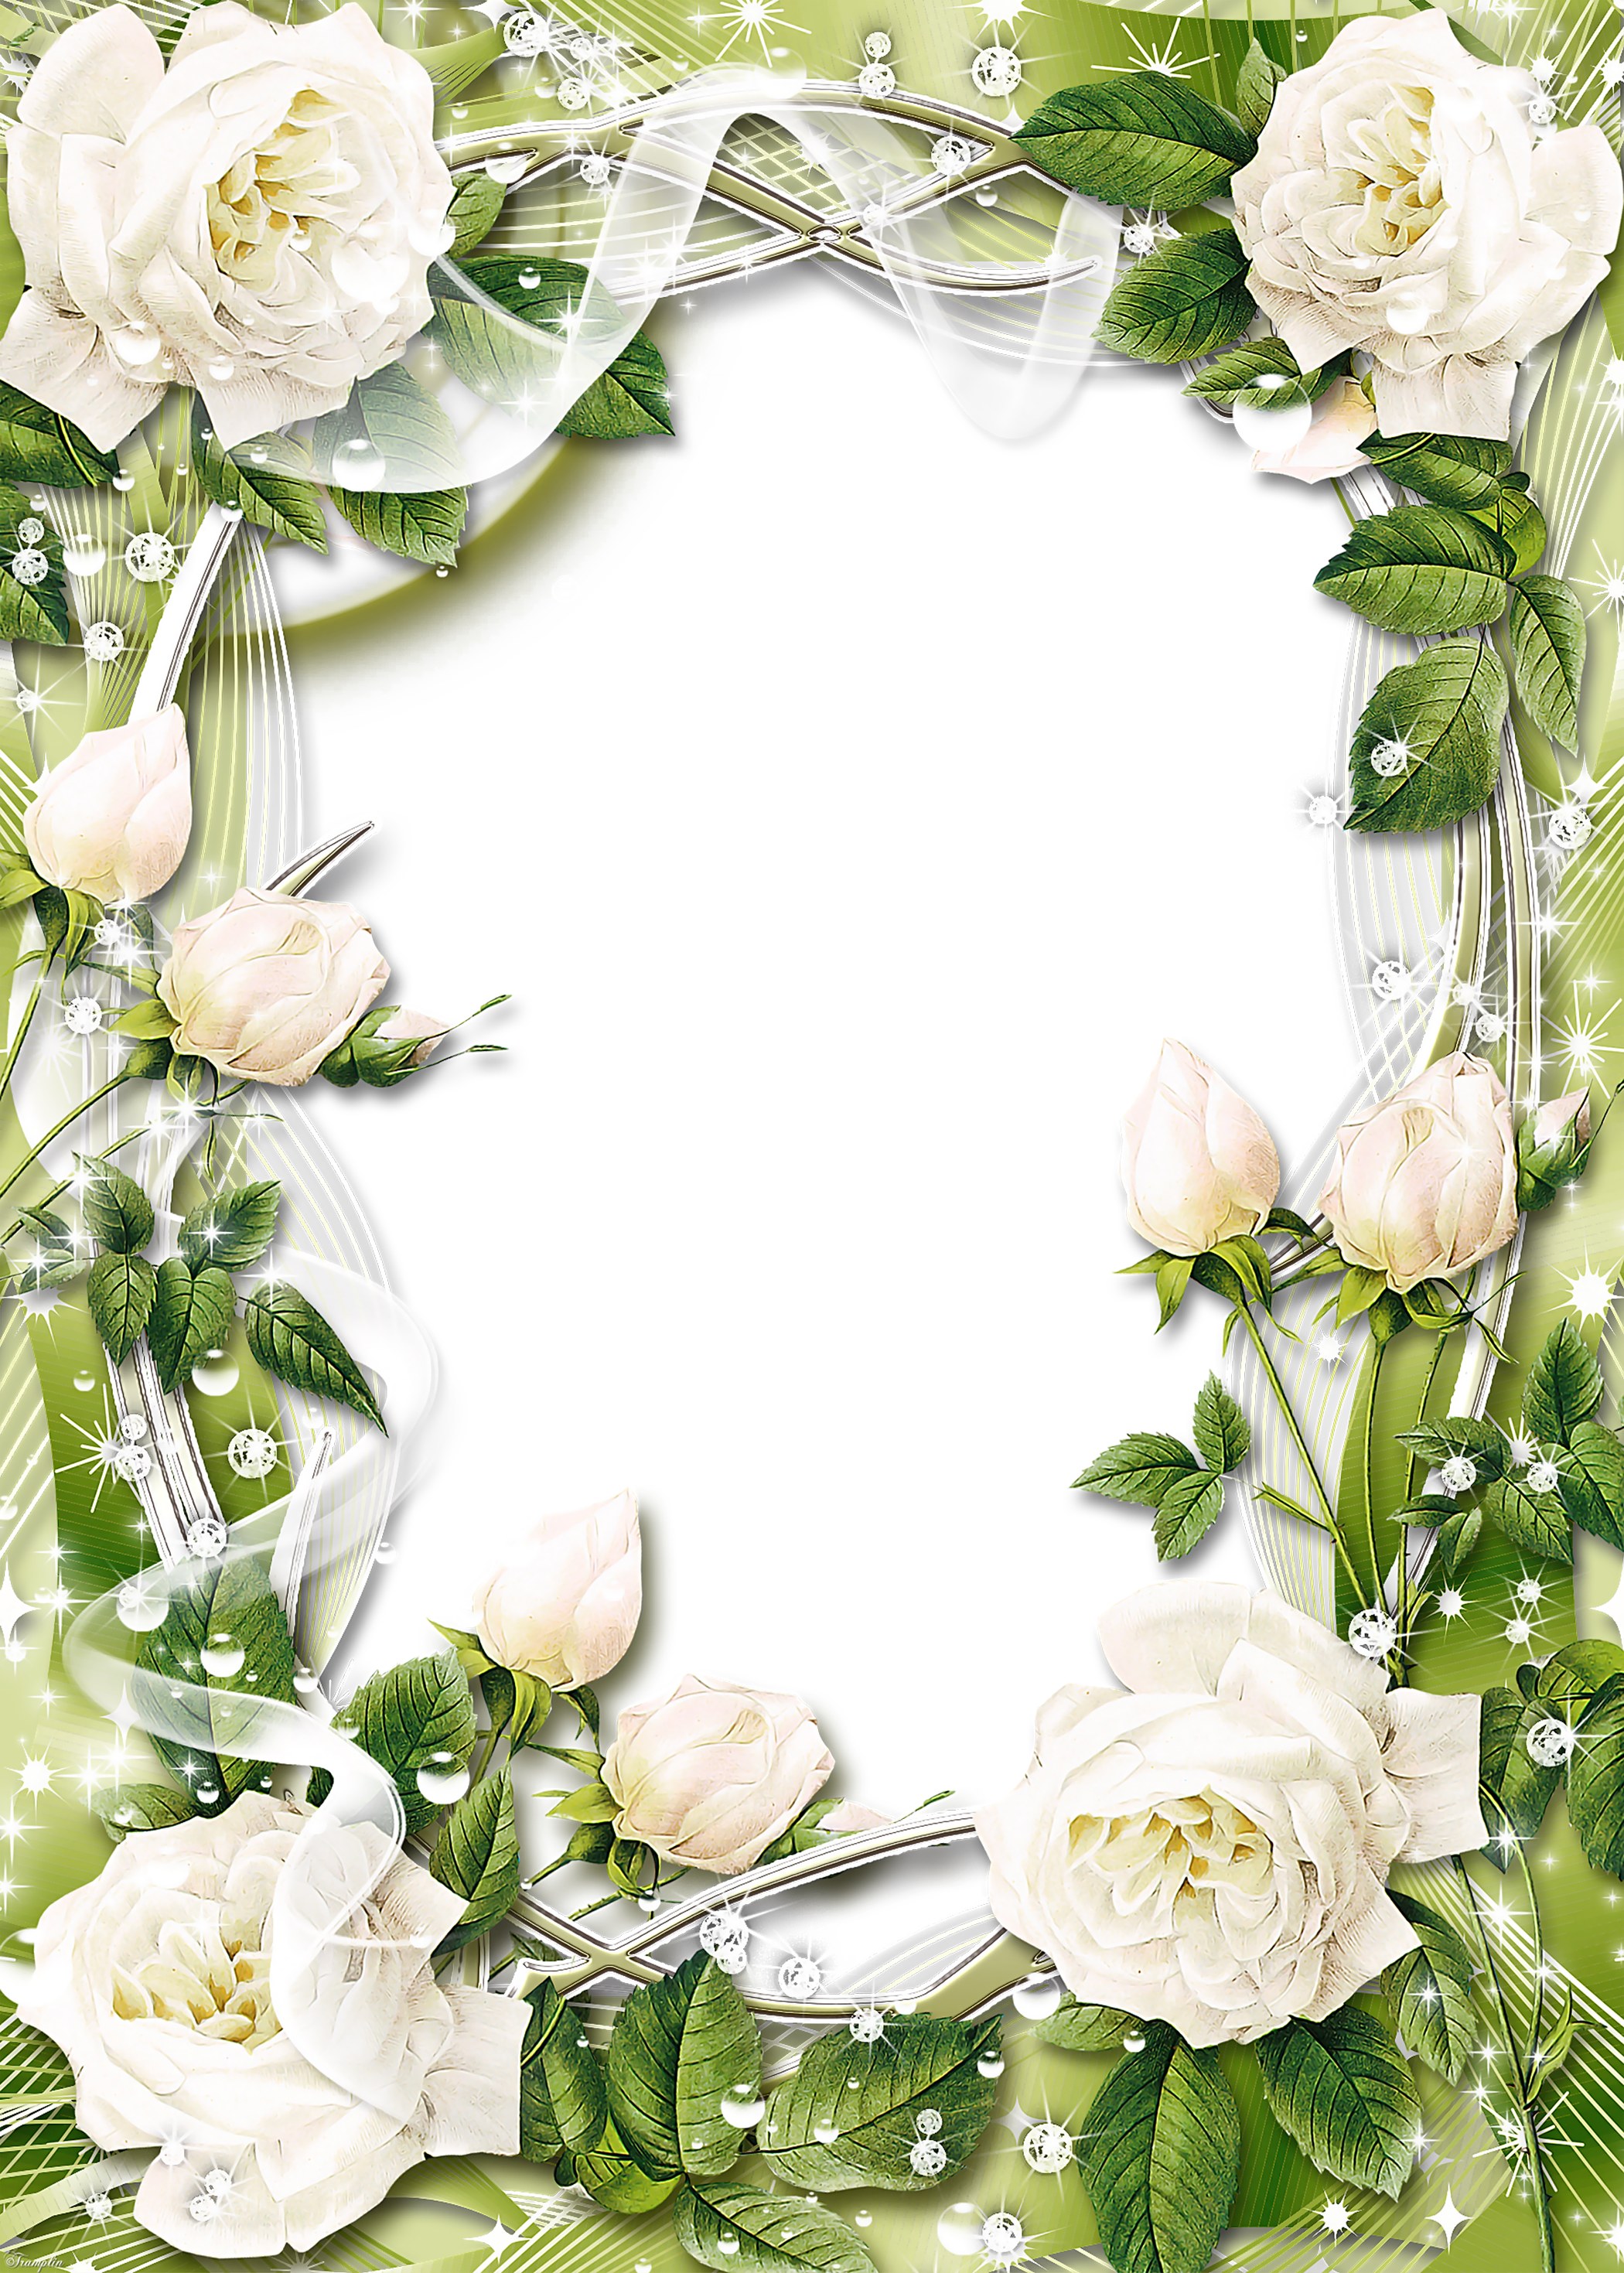 Groen transparant png fotolijst. Clipart roses template